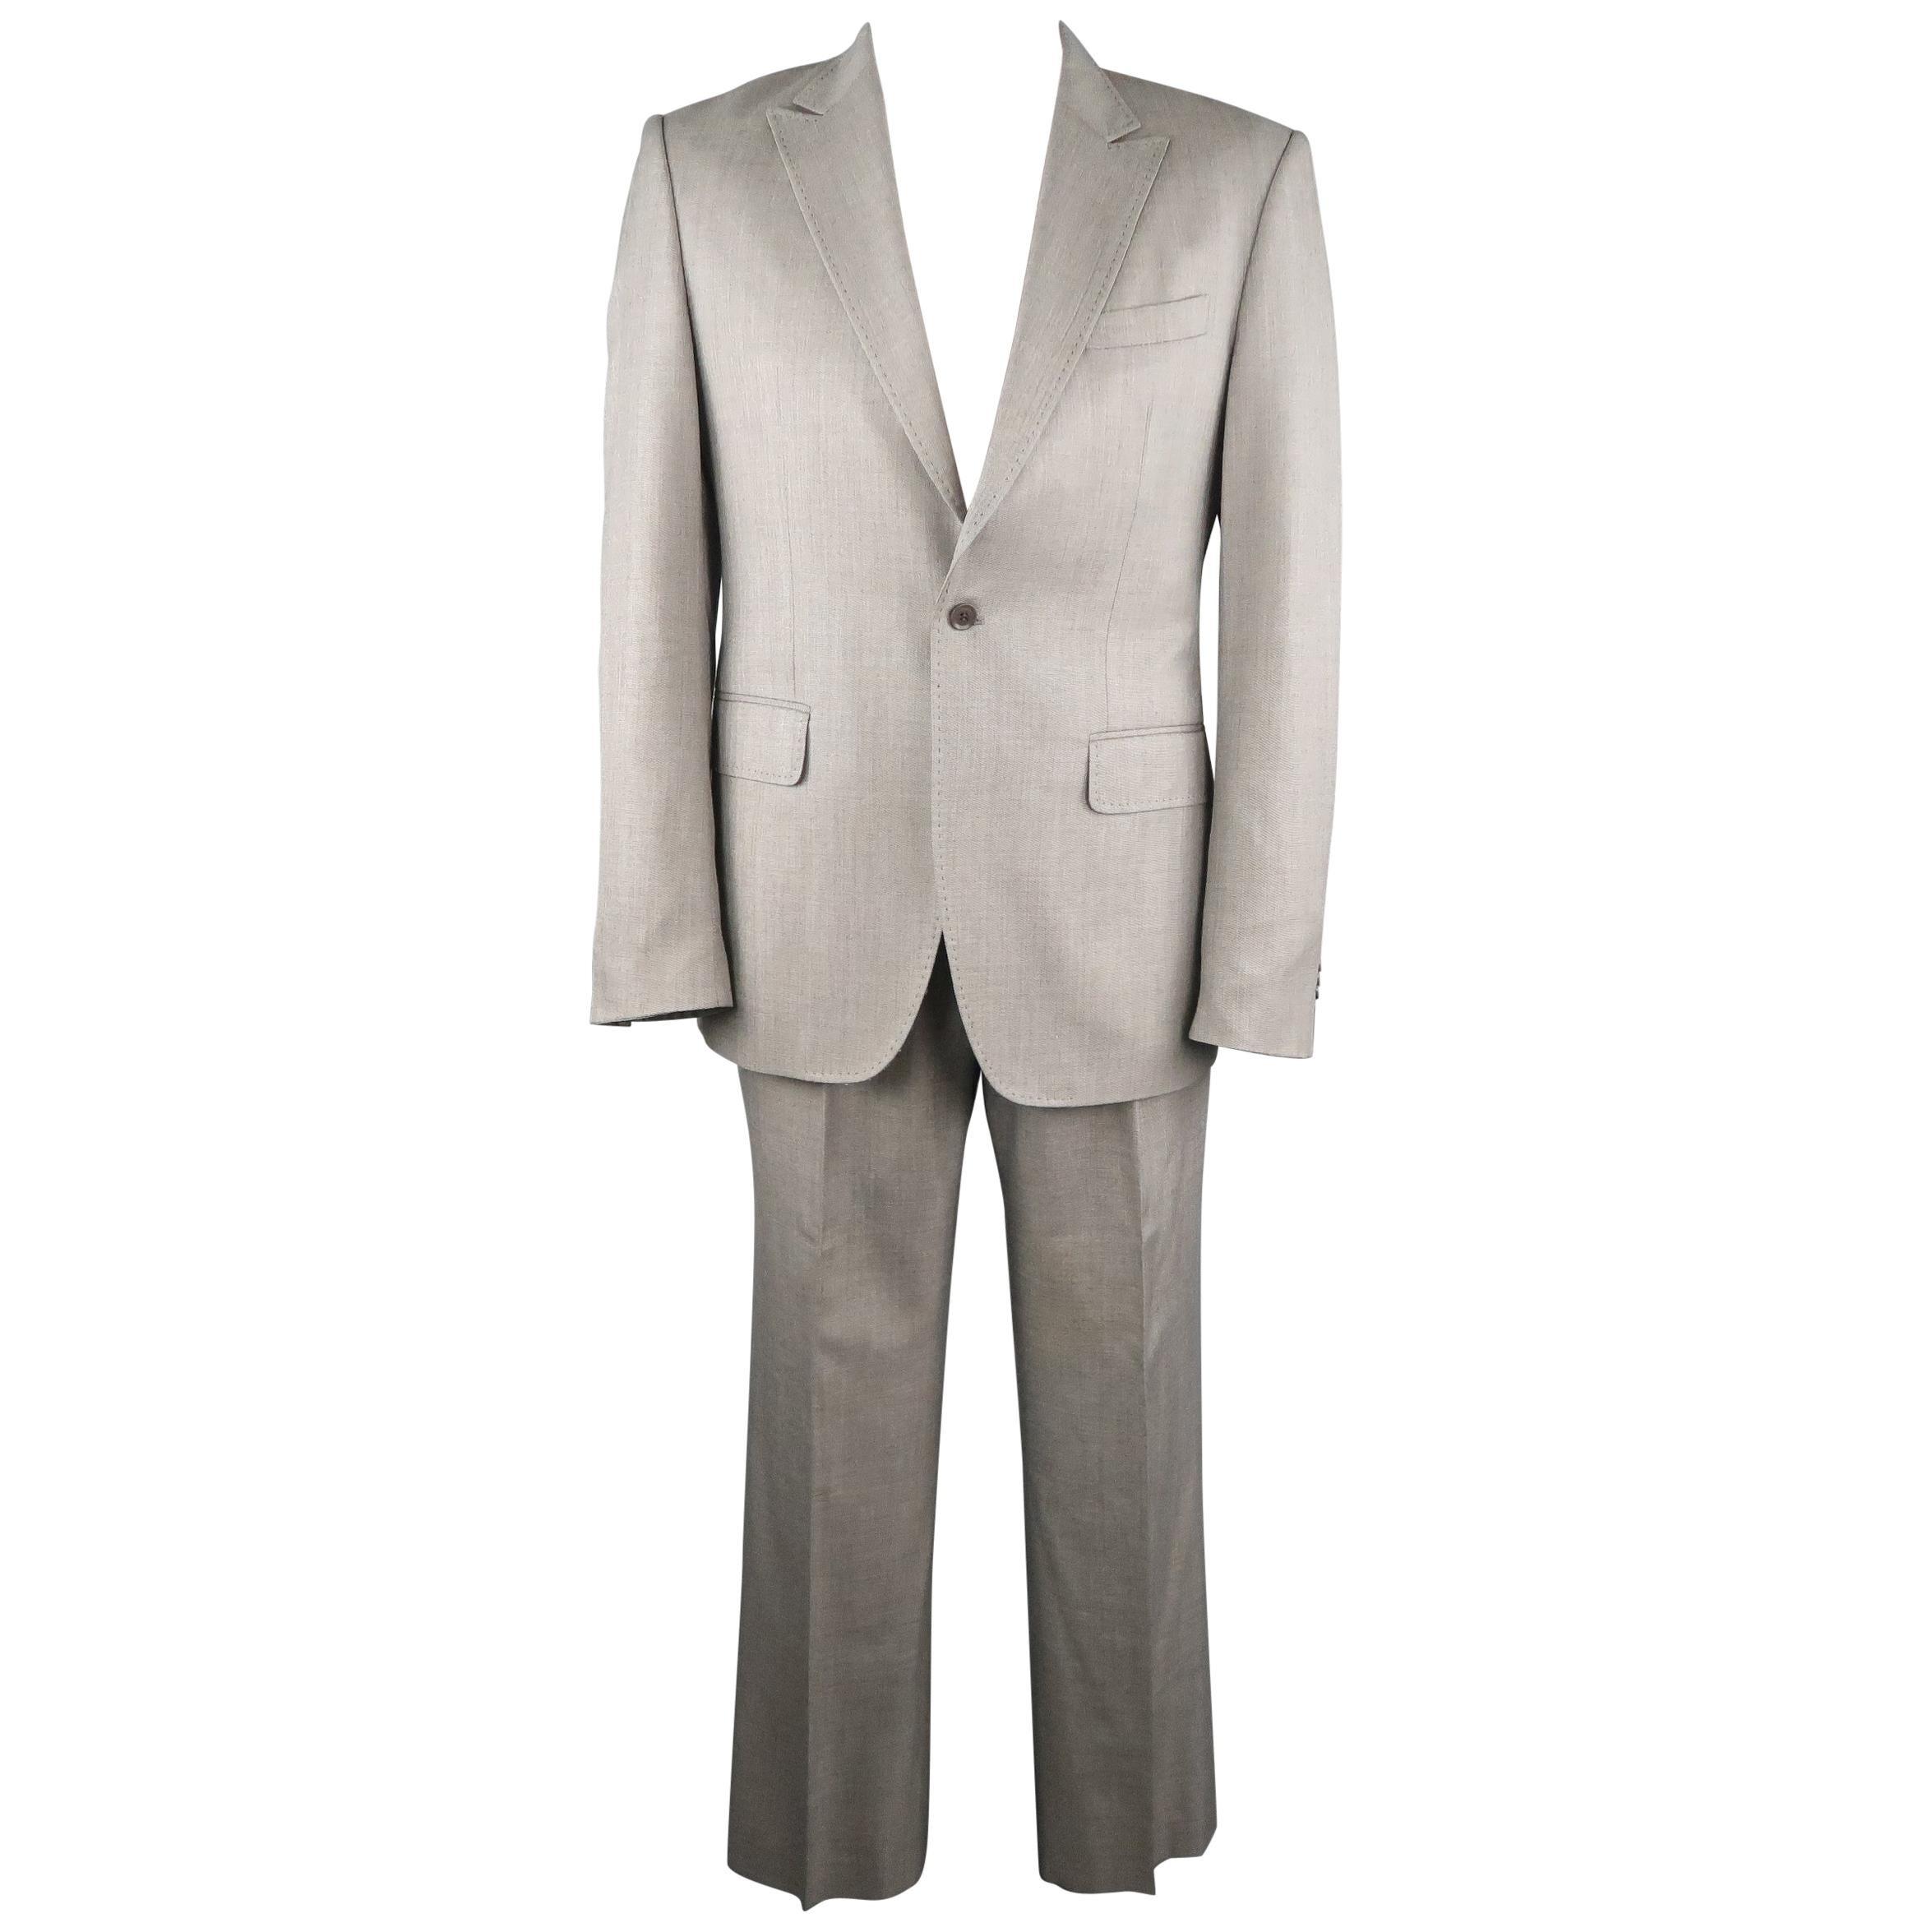 Men's PACO RABANNE 44 Silver Grey Solid Wool Blend Top Stitch Peak Lapel Suit